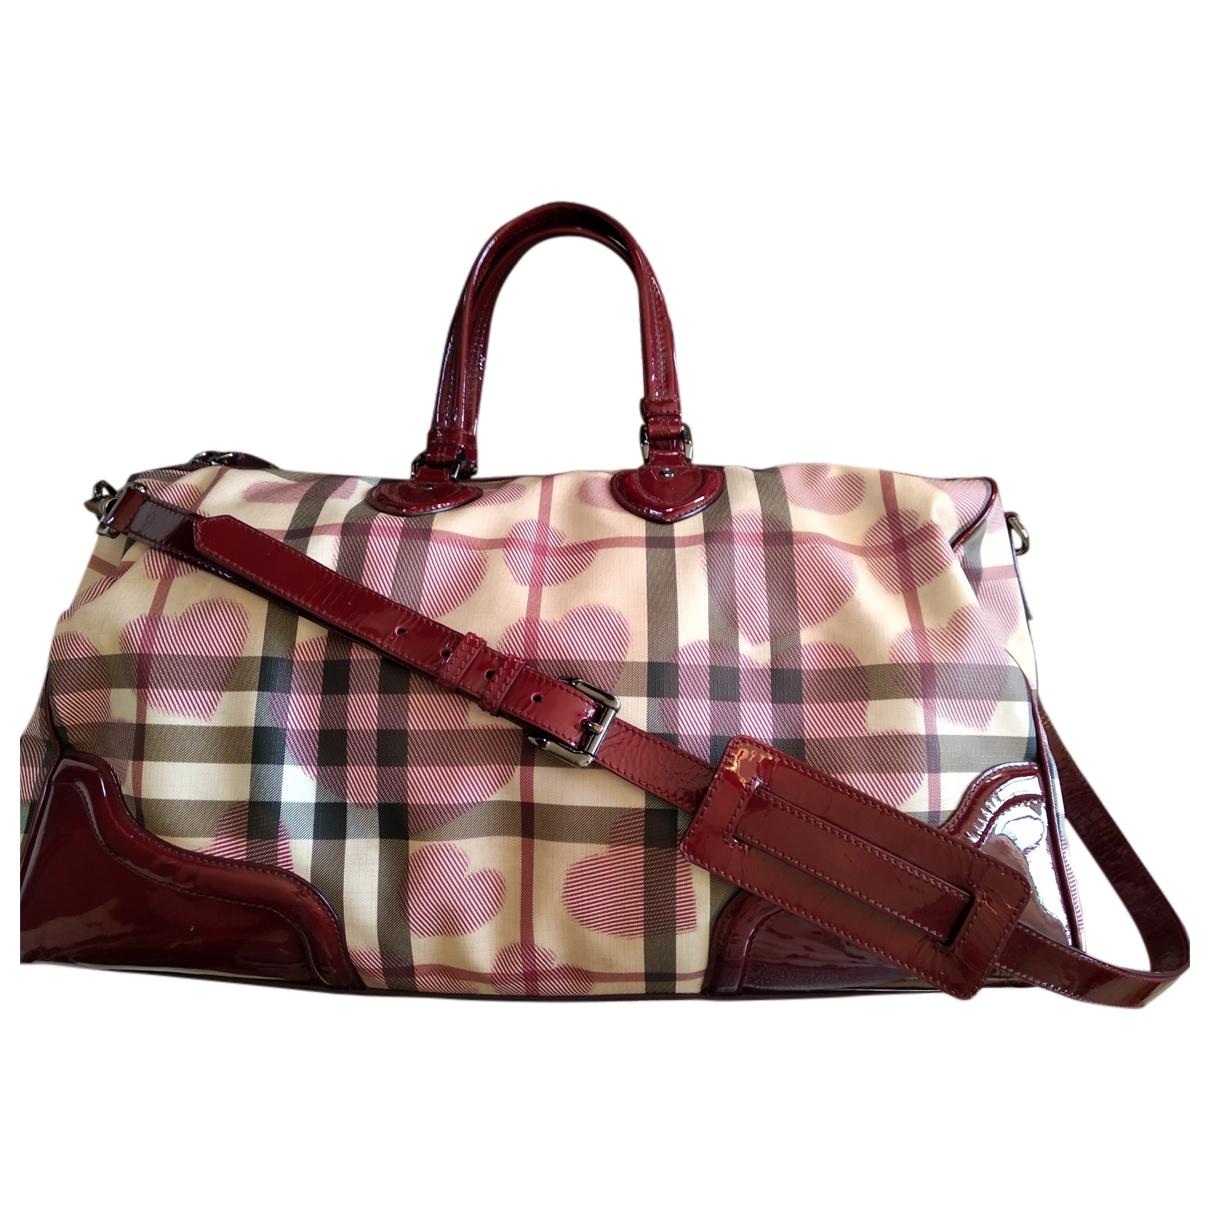 Burberry \N Burgundy Cloth Travel bag for Women \N